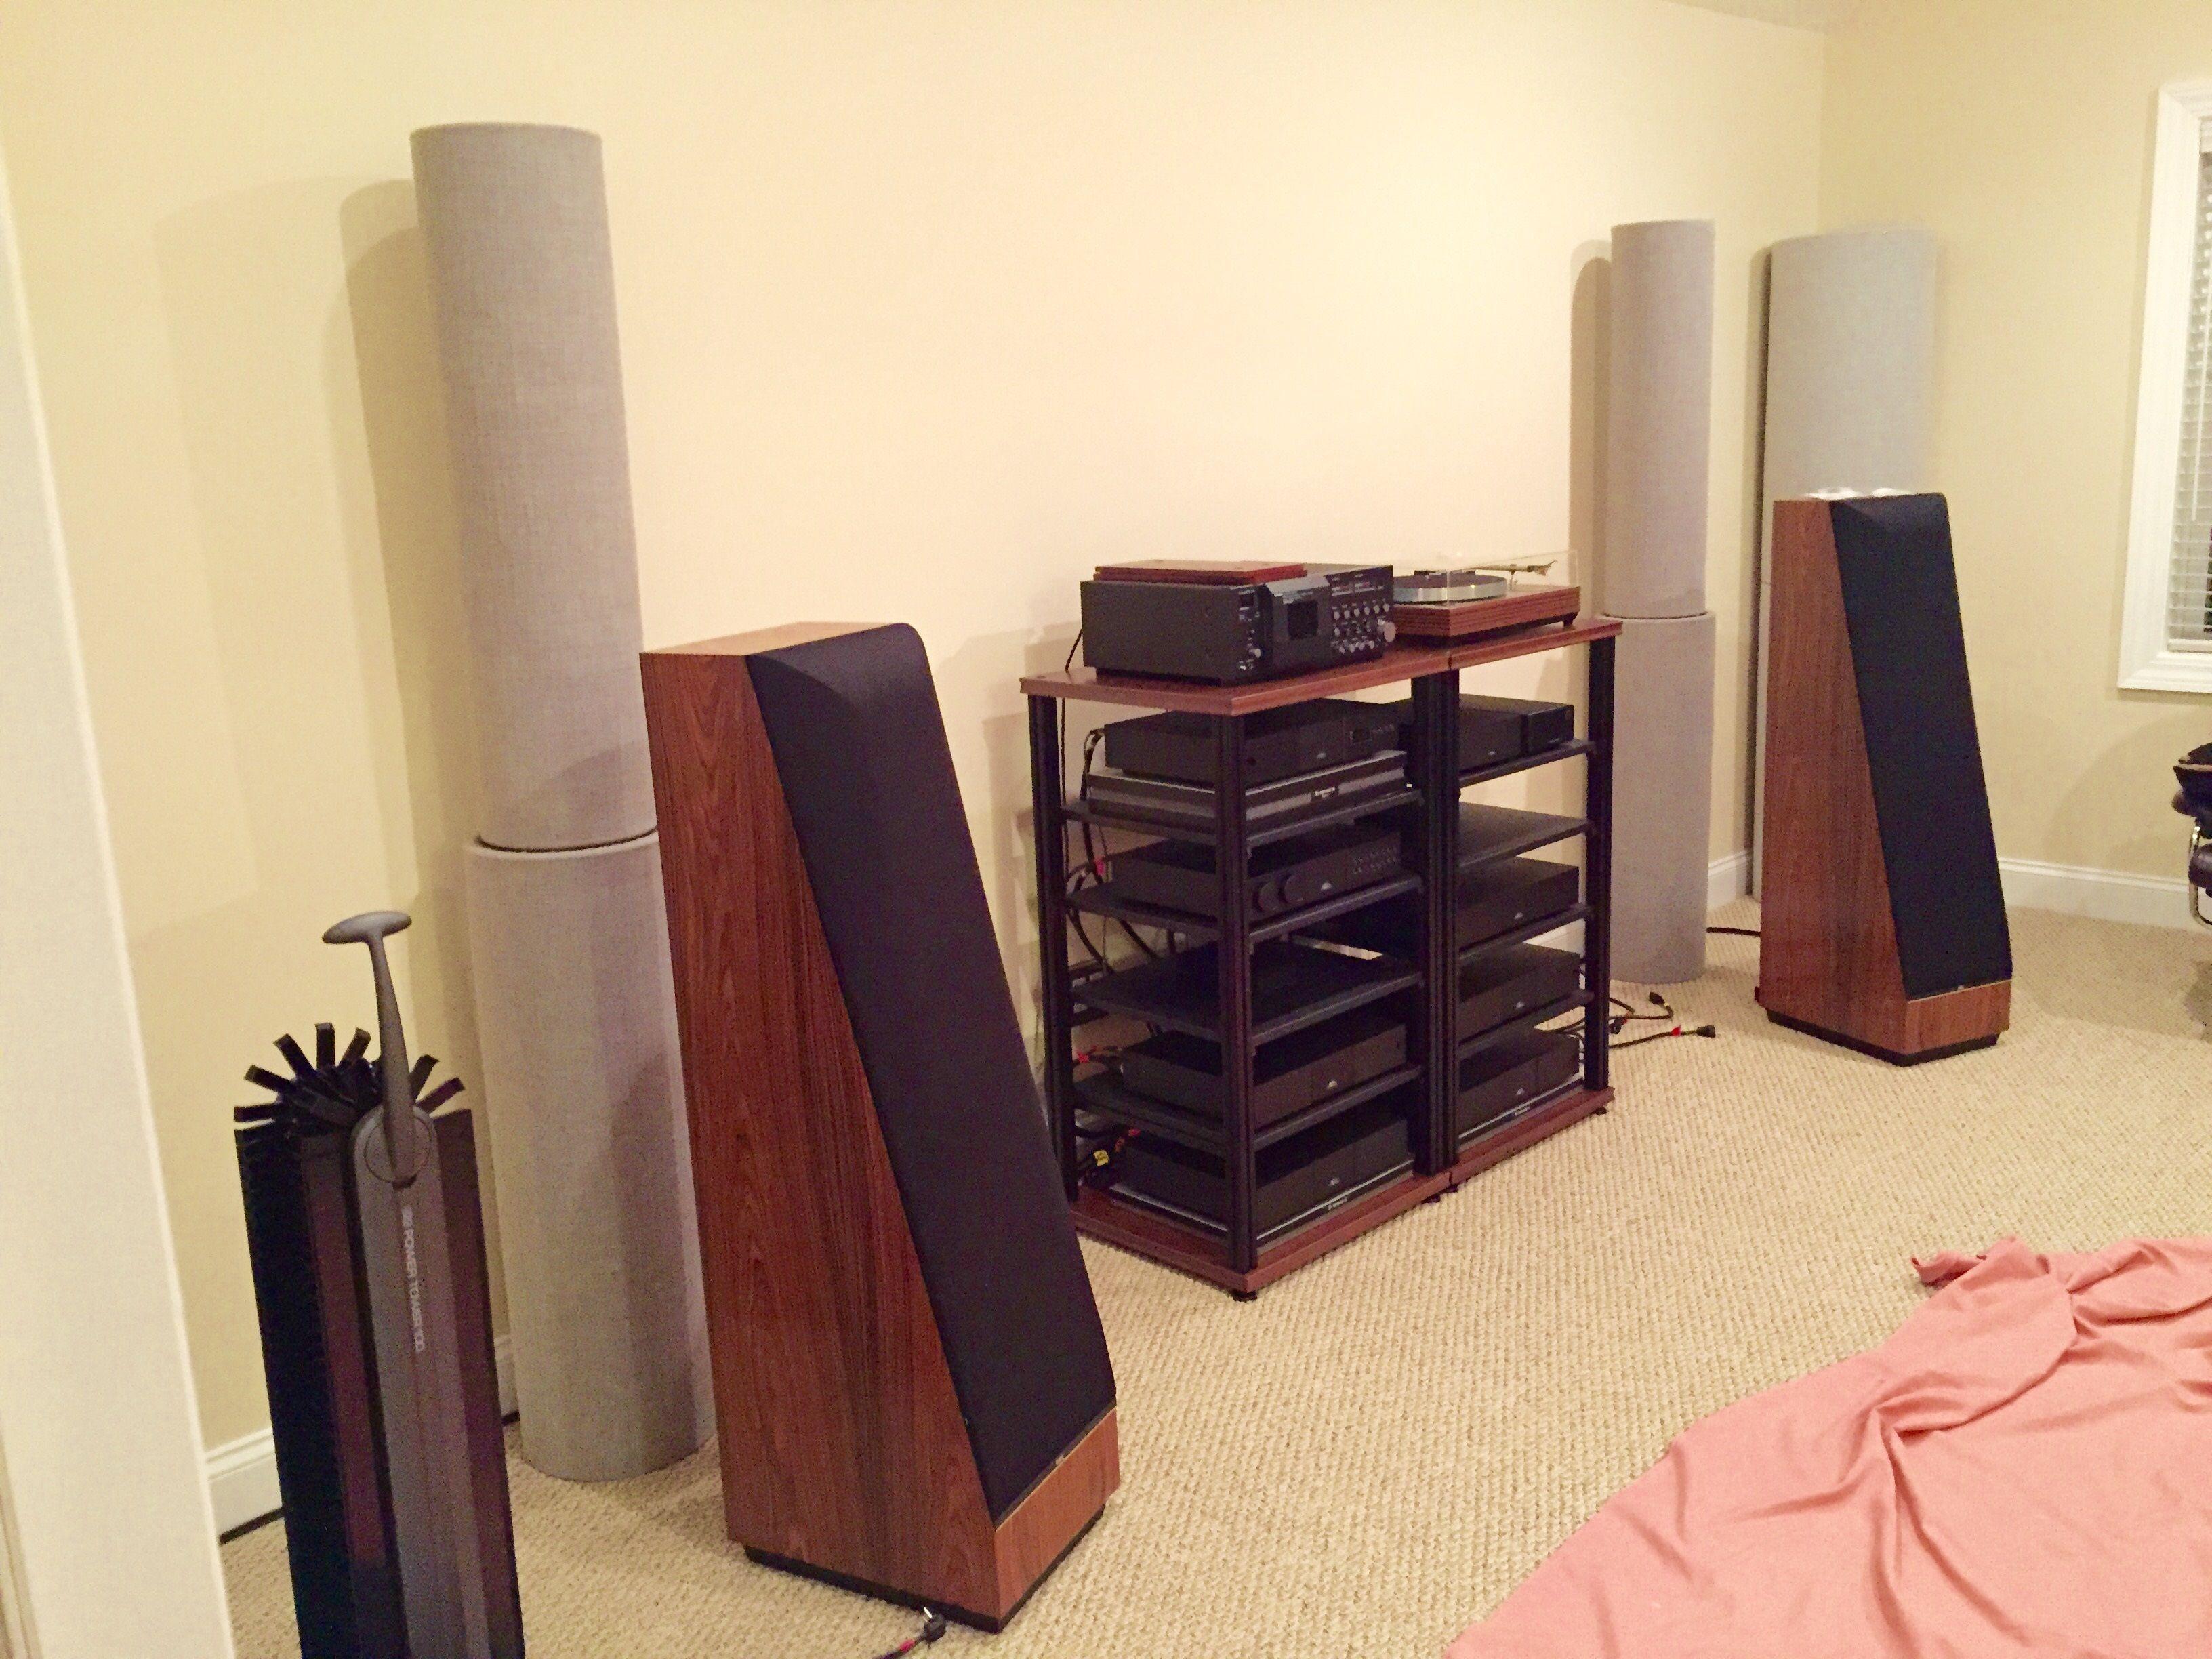 Thiel Naim Hifi High End Audio Stereo Speakers